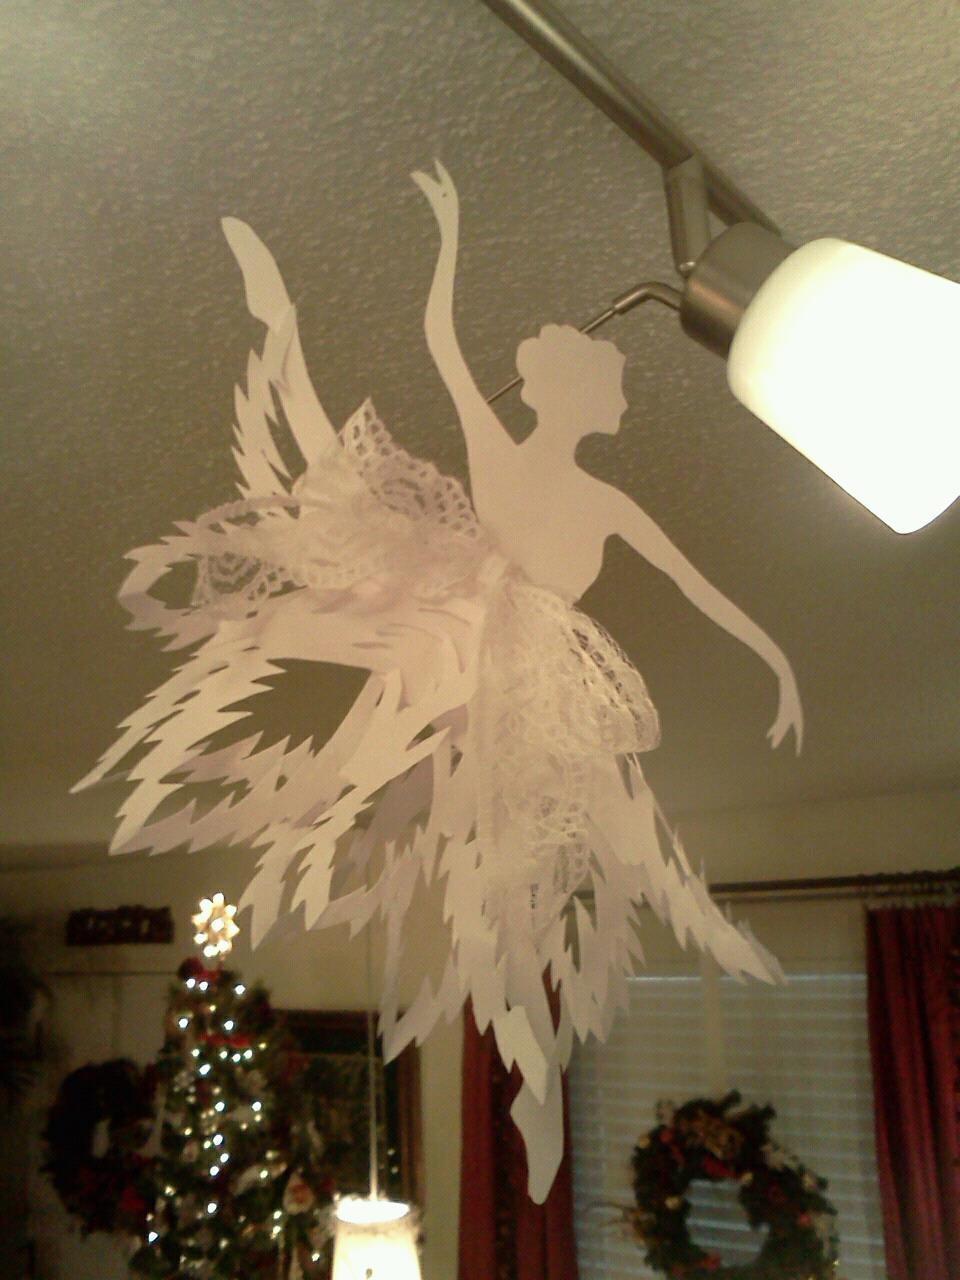 or Honey Ballerina Ballerinas Snowflakes Bee's BlissSnowflake LSUpjVGqzM